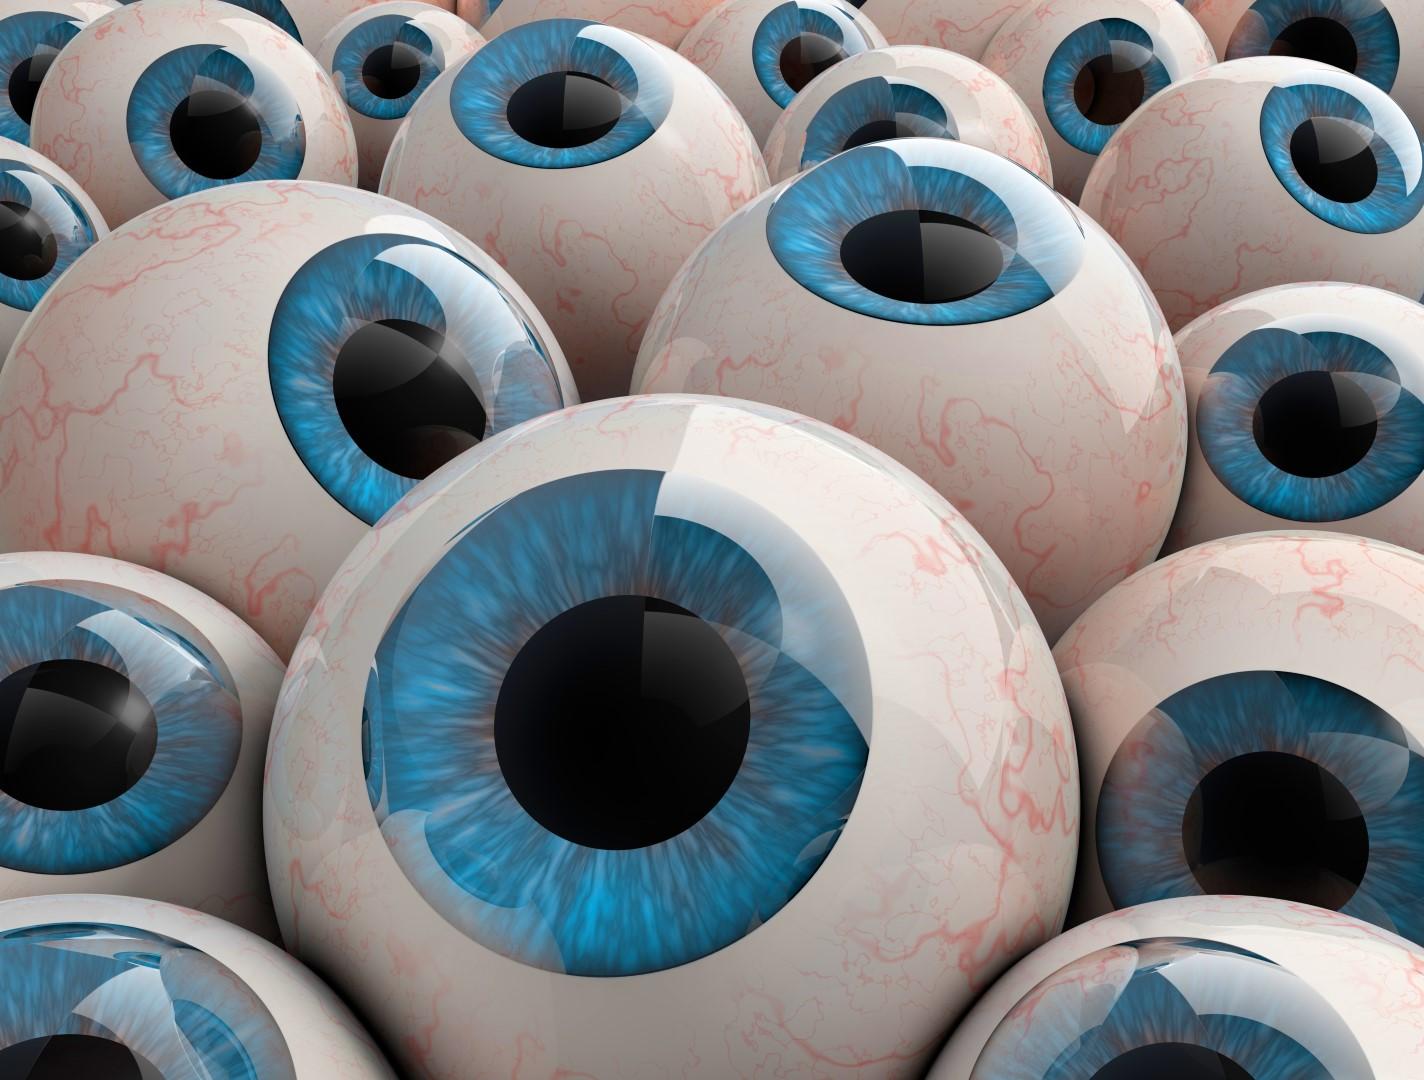 eyeballs-large